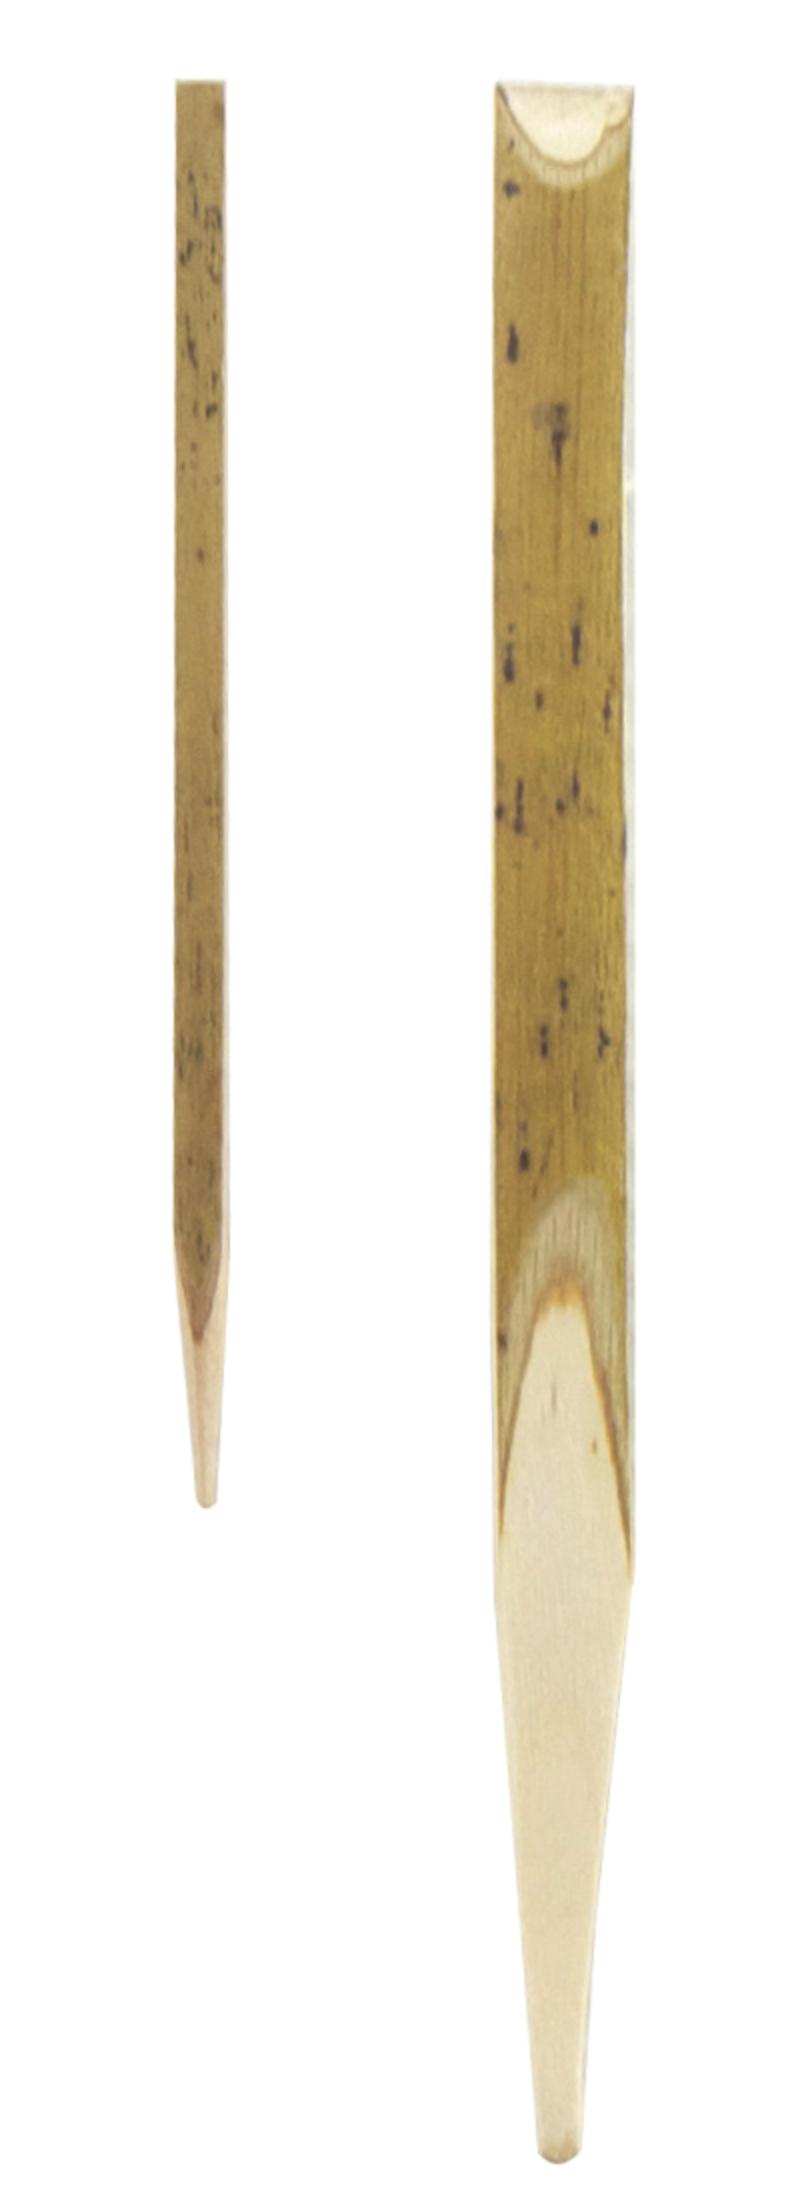 Kuromoji Black Willow Pick - Tooth Pick - 2.5 x .08 in